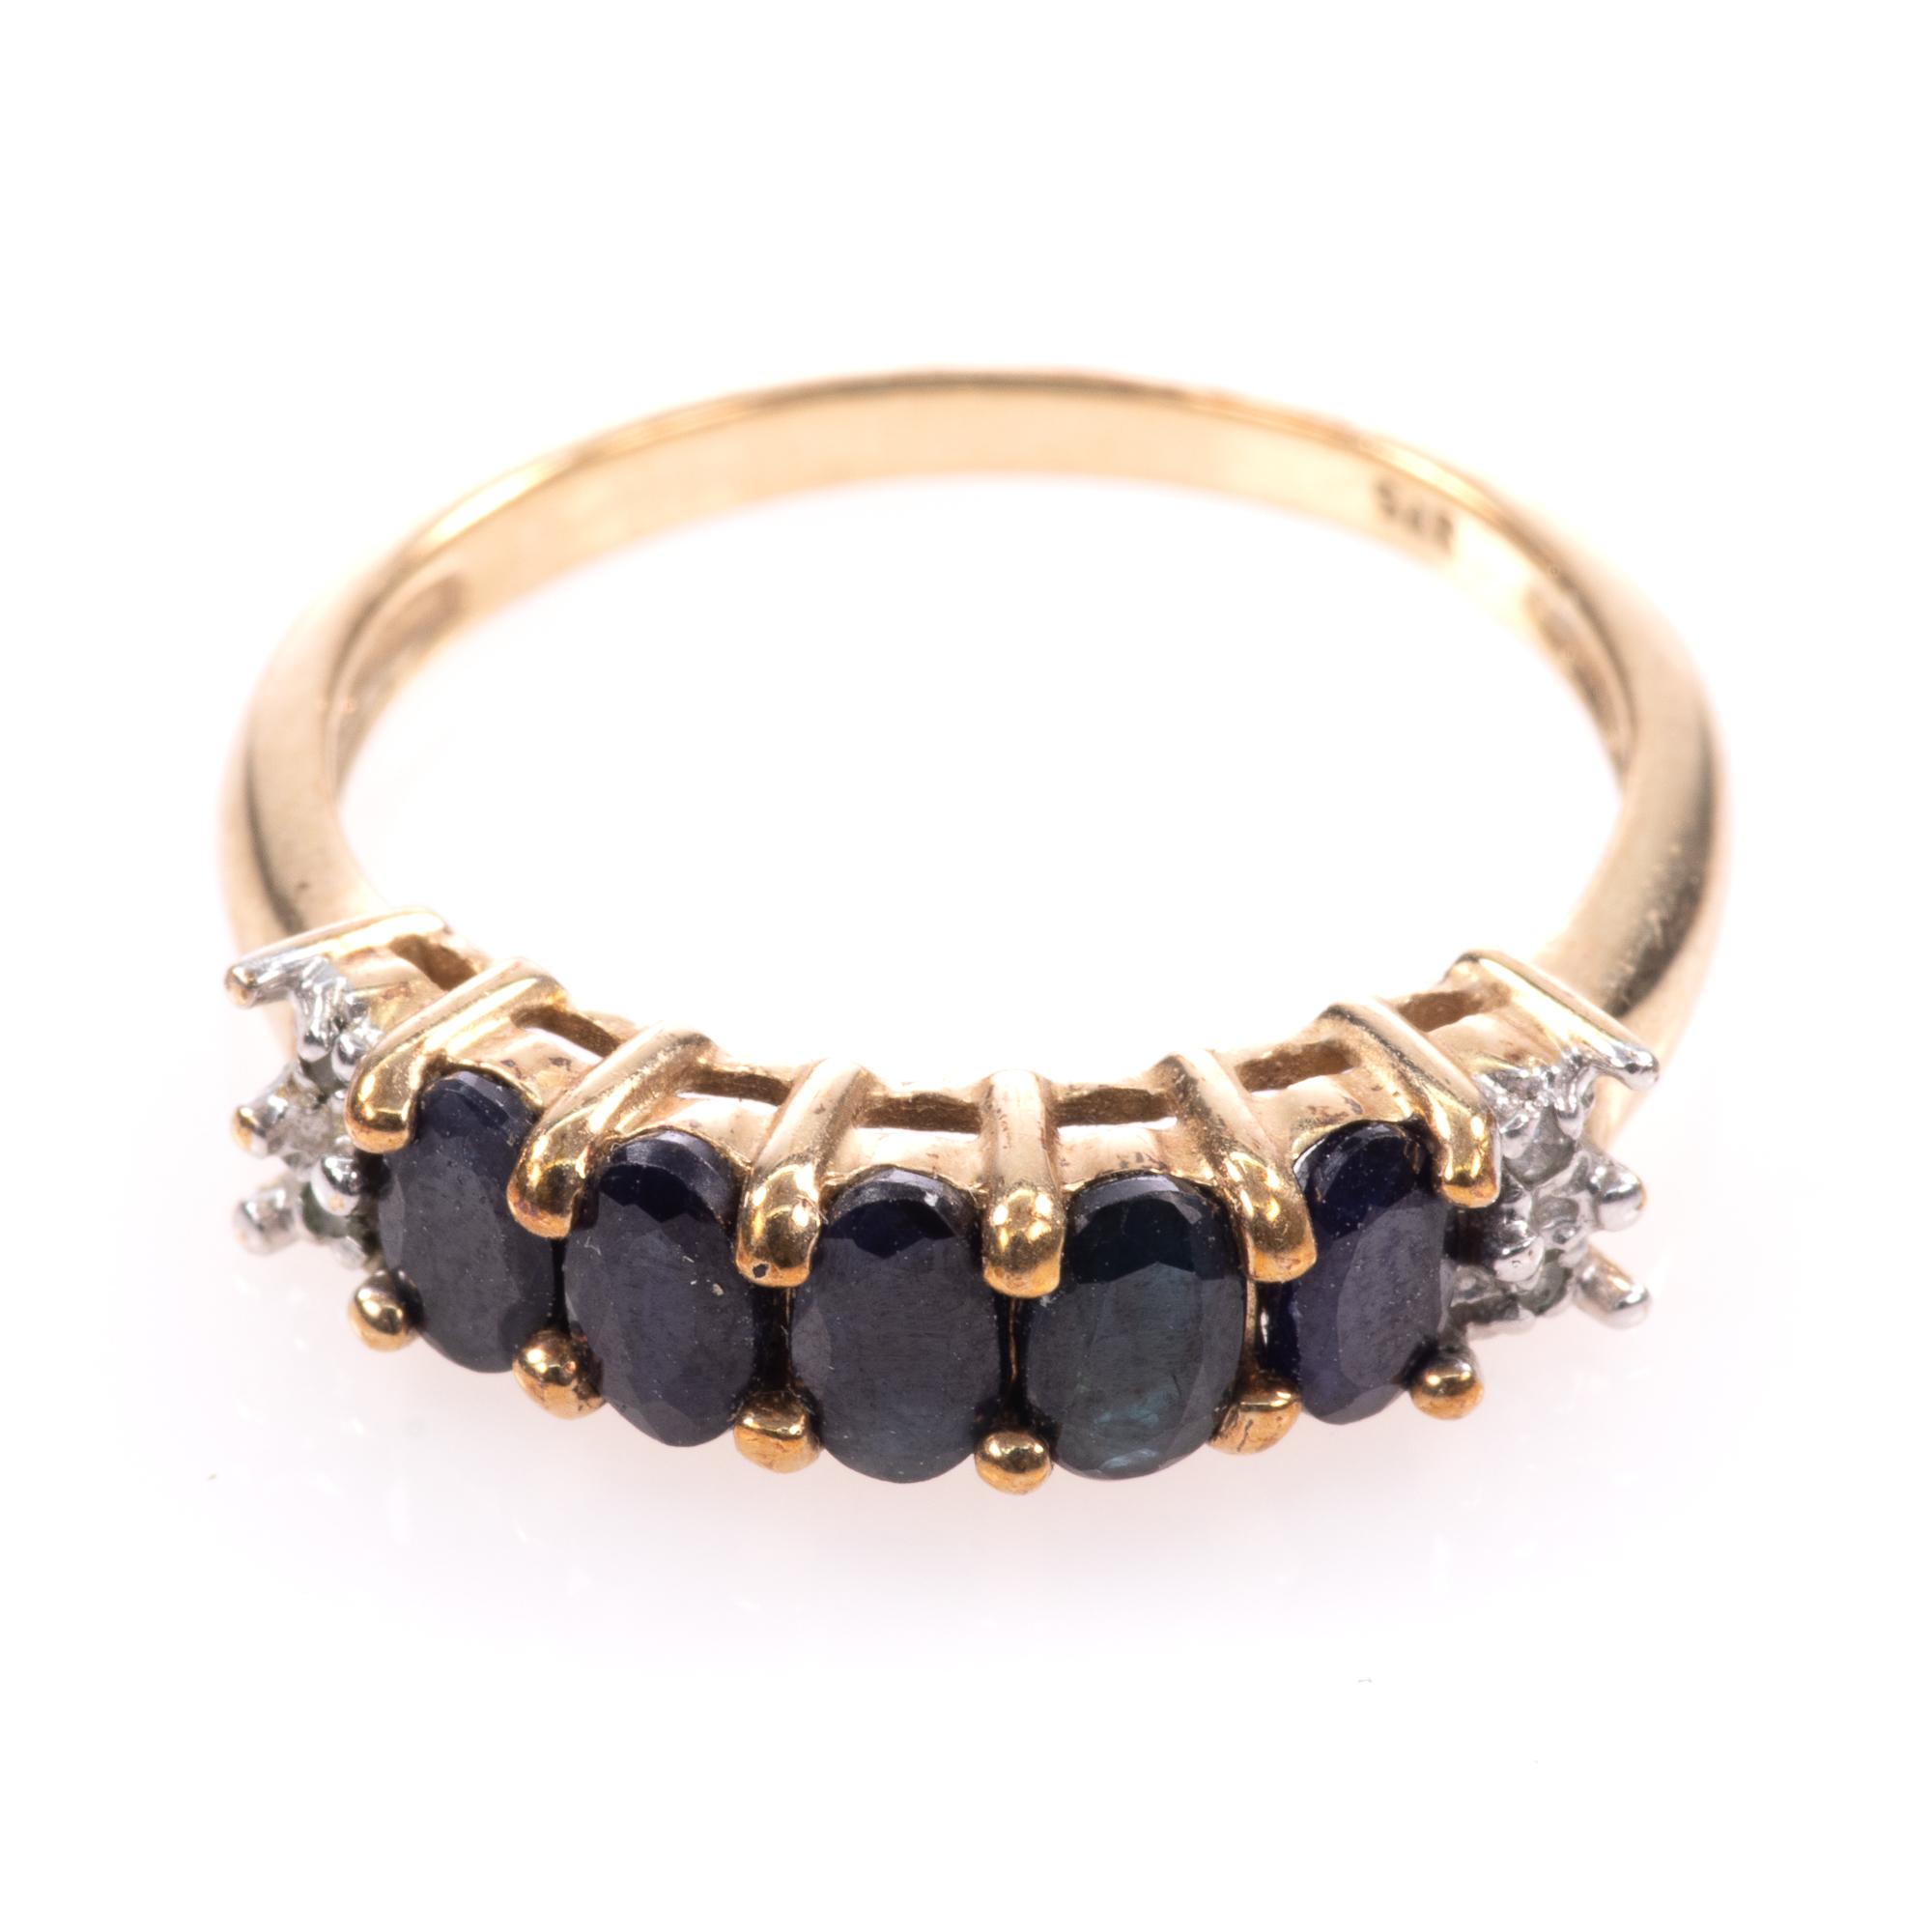 9ct Gold 5ct Sapphire & Diamond Ring - Image 3 of 7